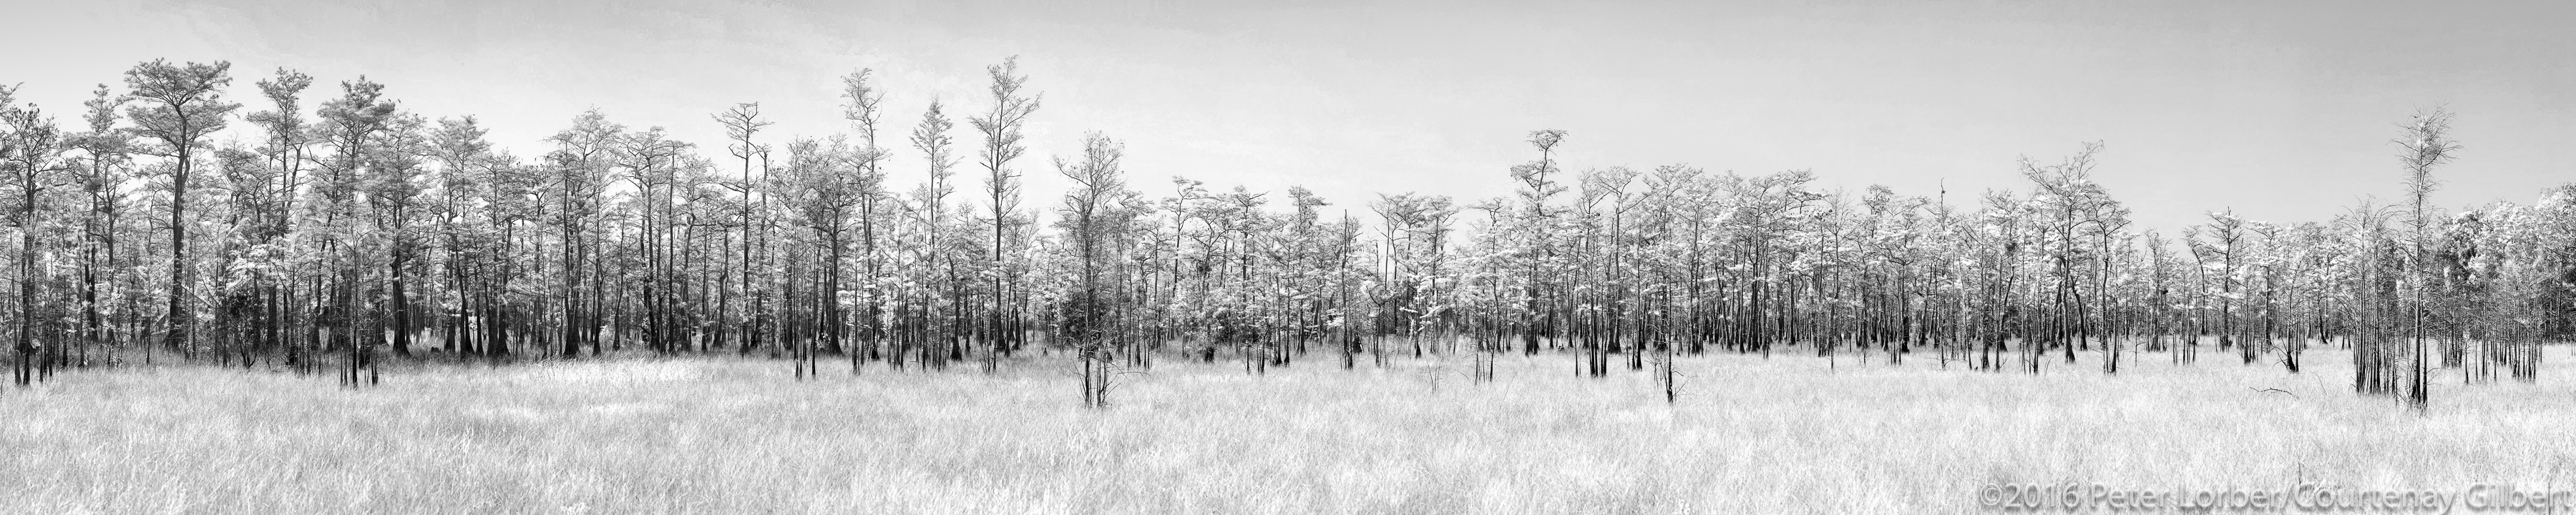 Everglades Trees